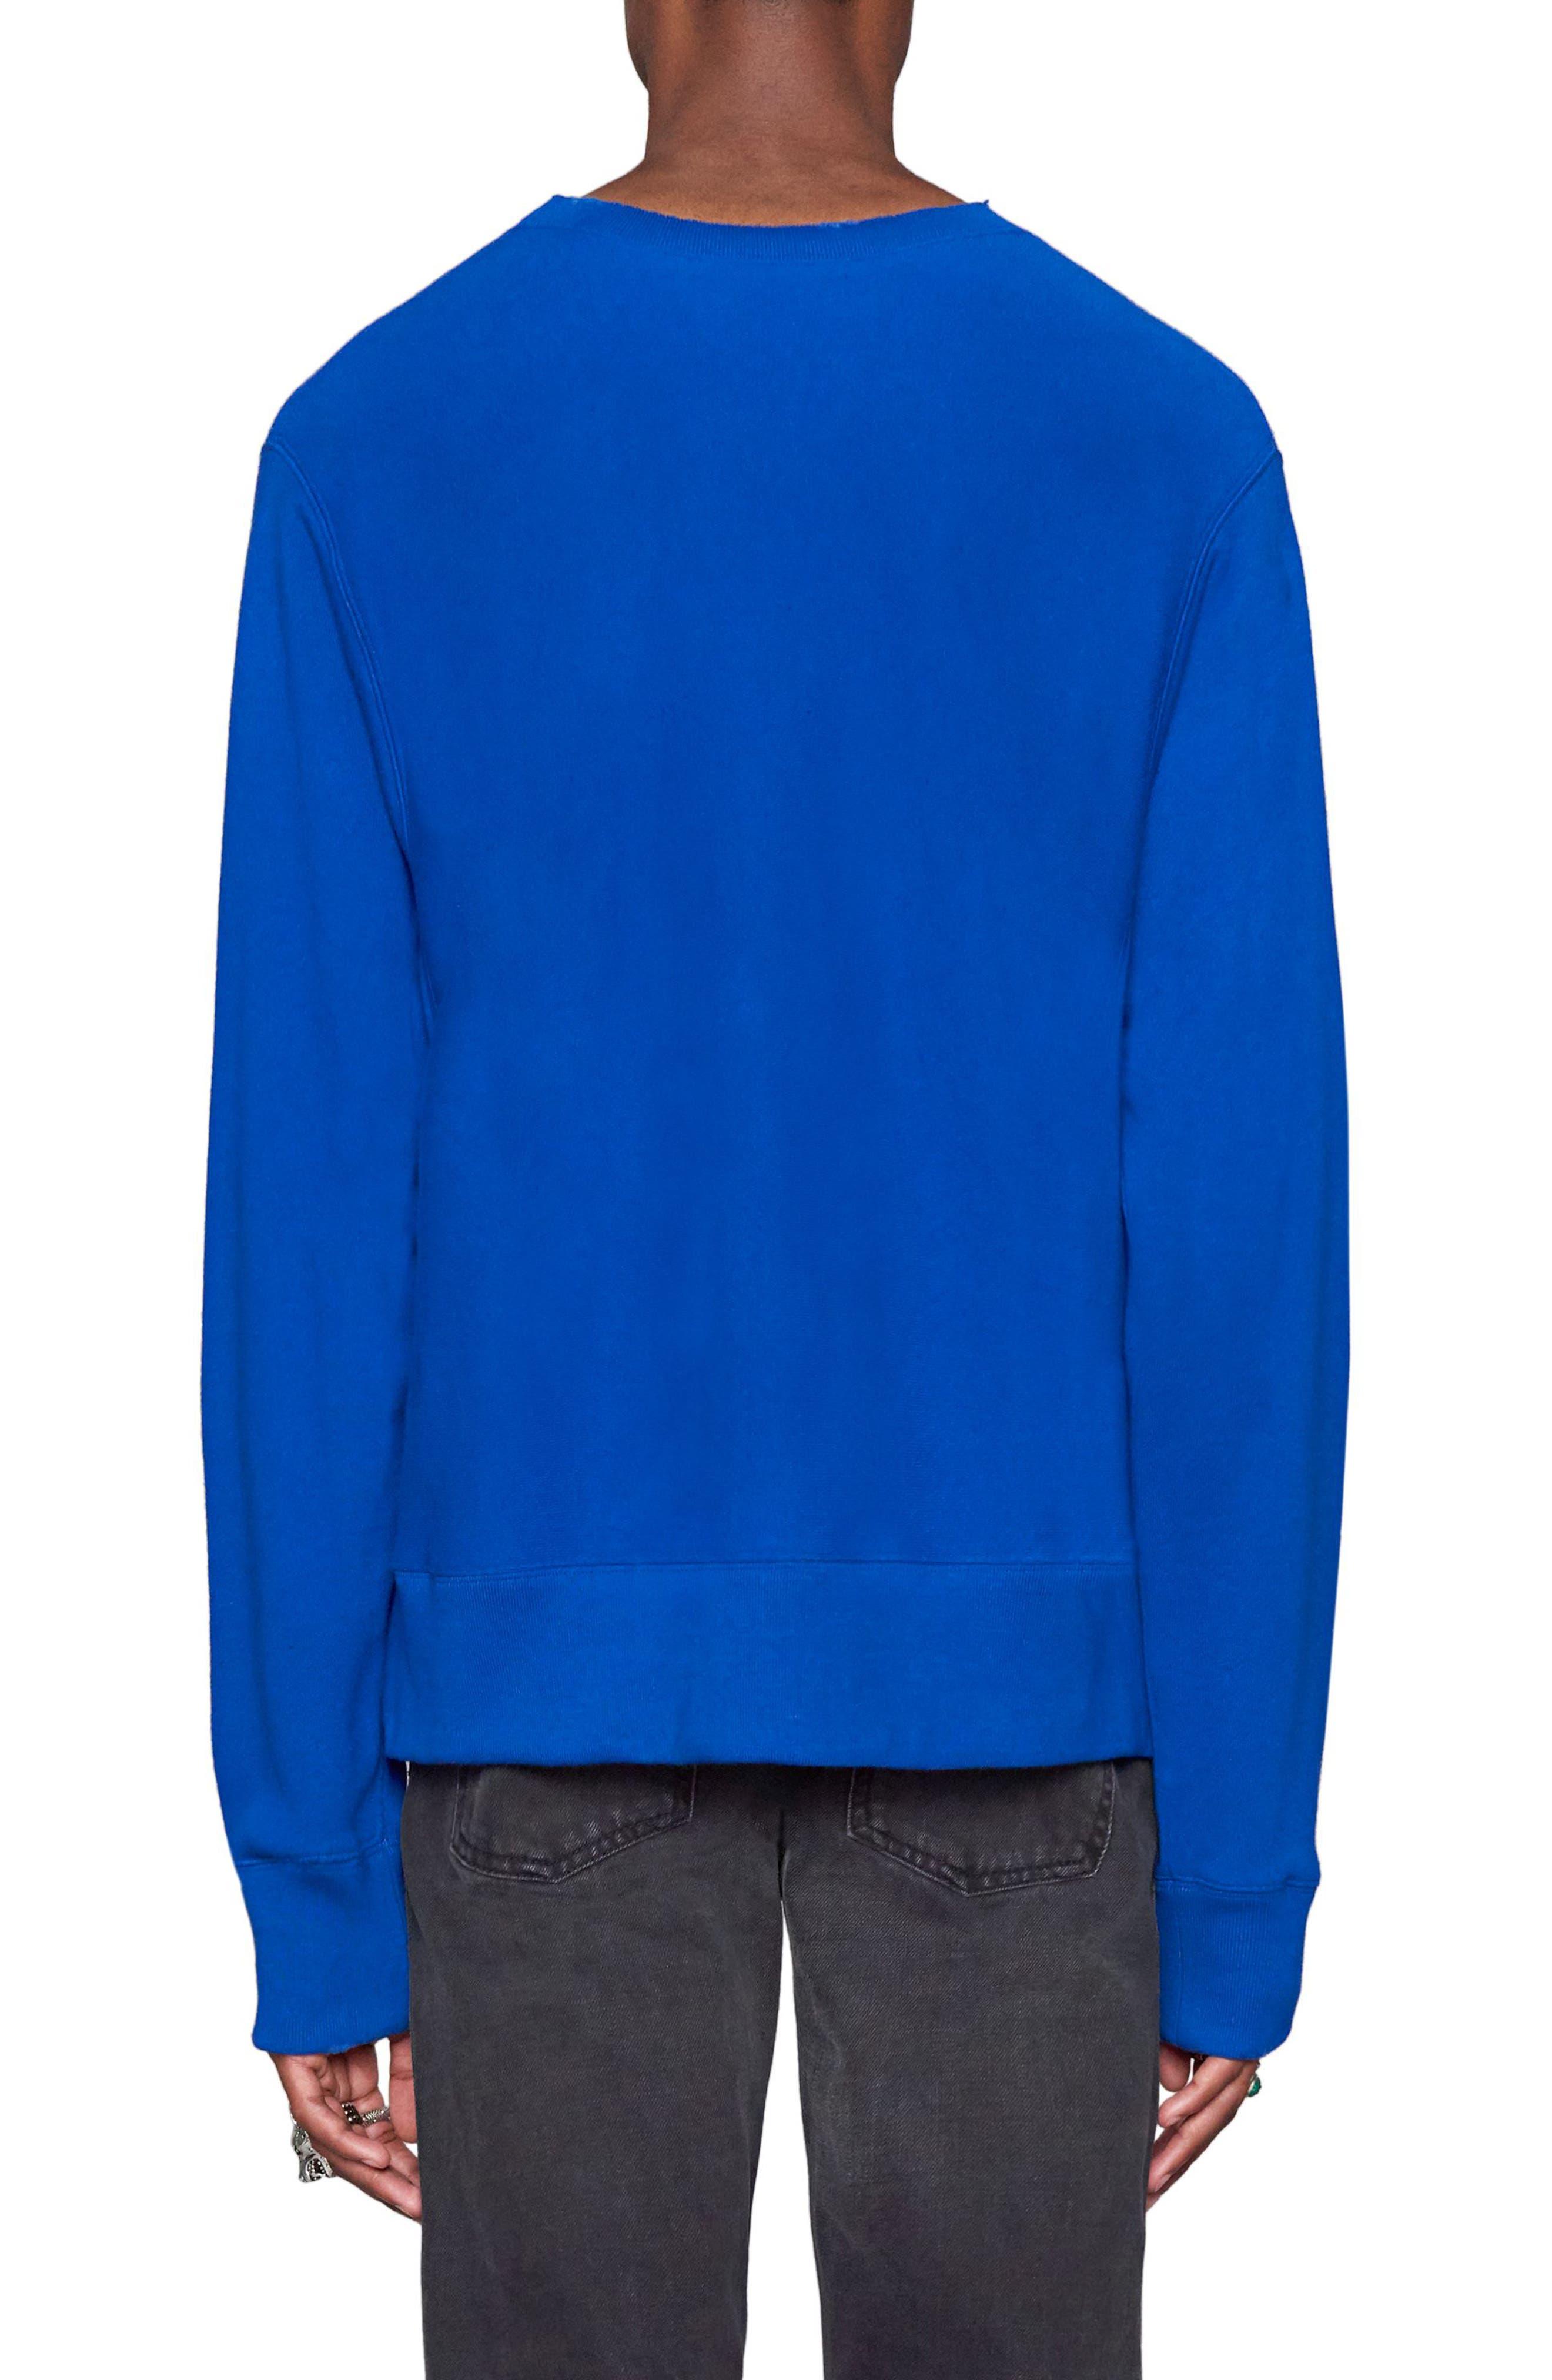 Snake Stamp Graphic Crewneck Sweatshirt,                             Alternate thumbnail 2, color,                             Electric Blue